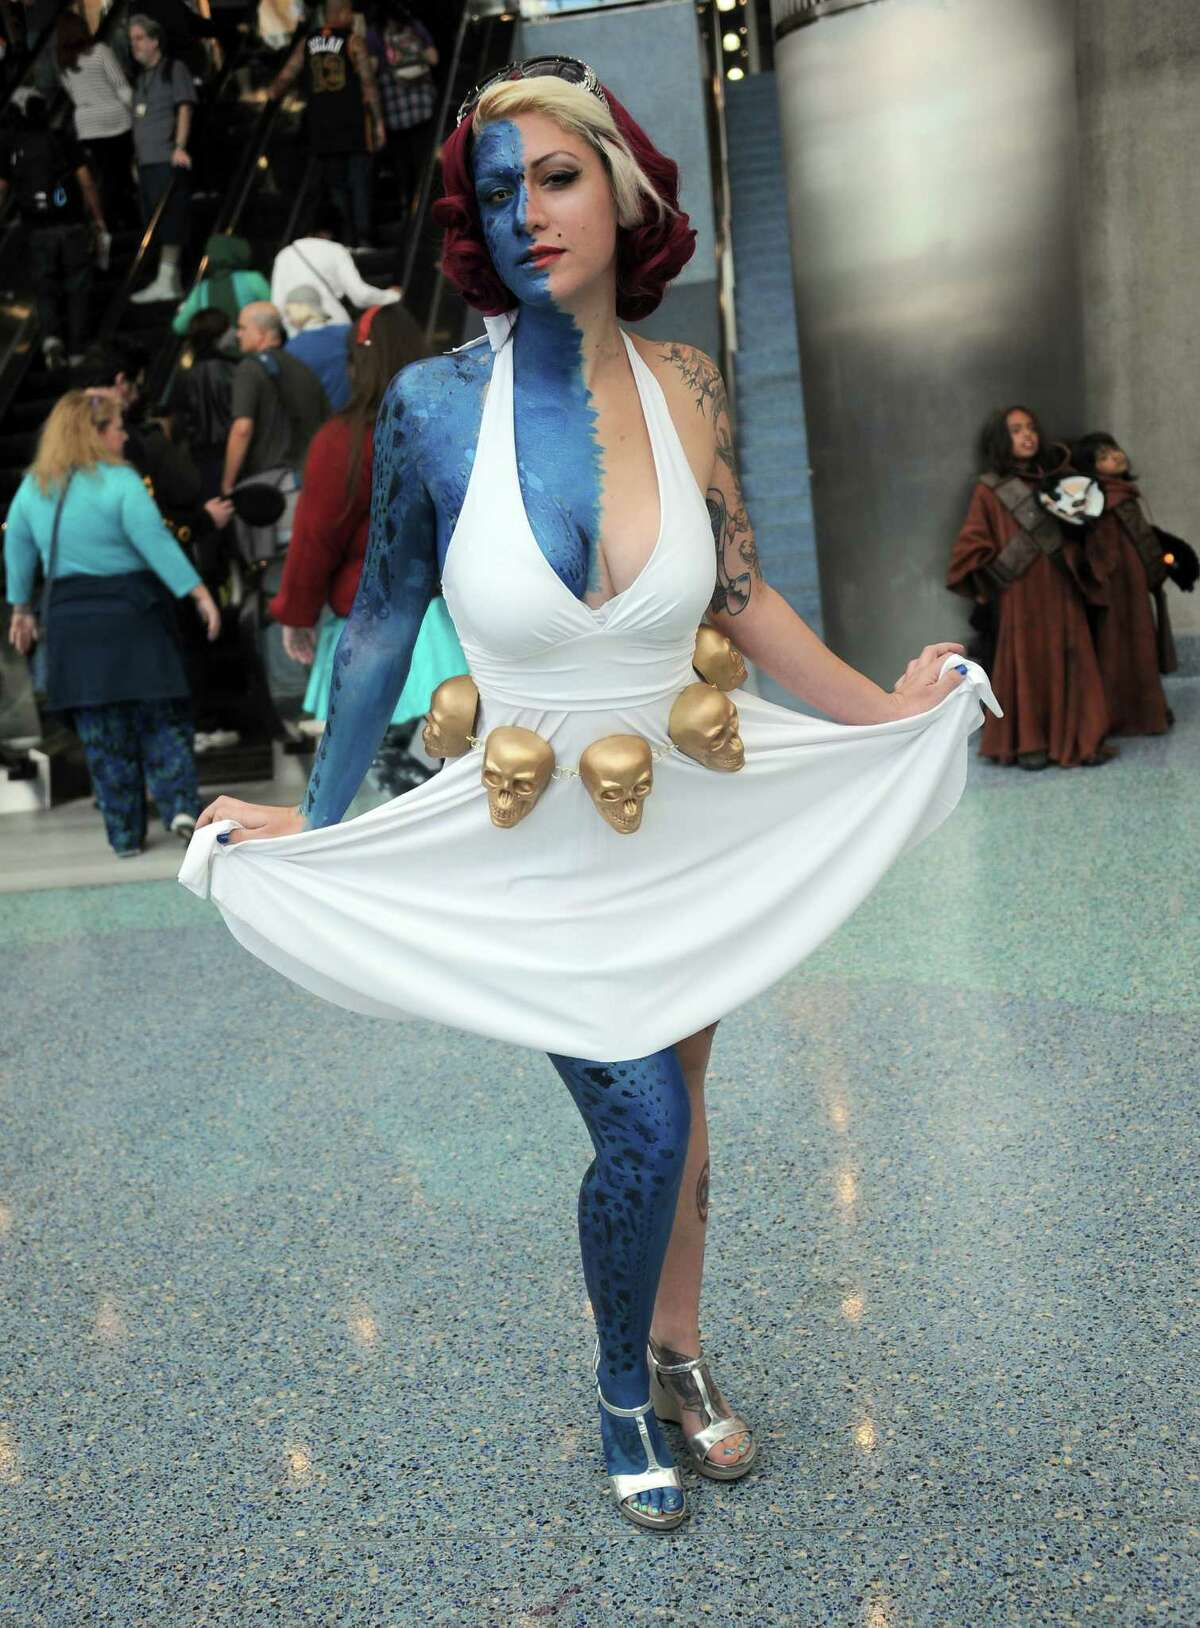 Cosplayer dressed as Mystique/Marilyn Monroe